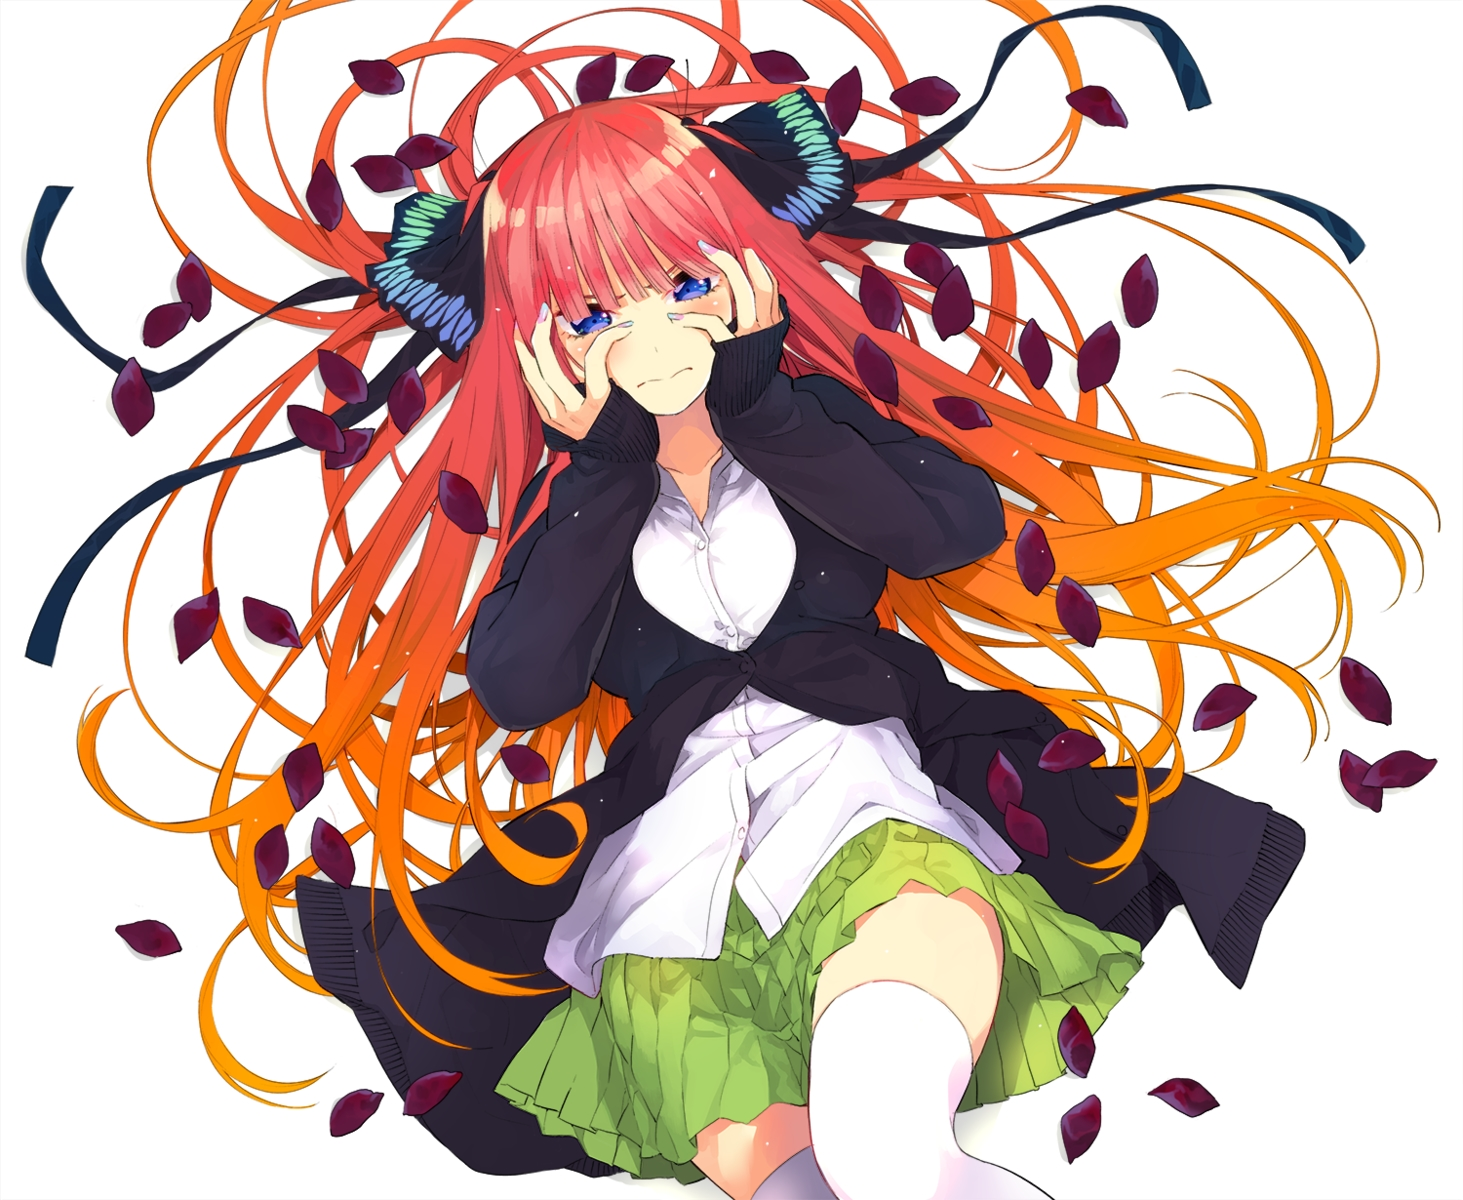 blue_eyes blush go-toubun_no_hanayome haruba_negi long_hair nakano_nino red_hair school_uniform skirt thighhighs